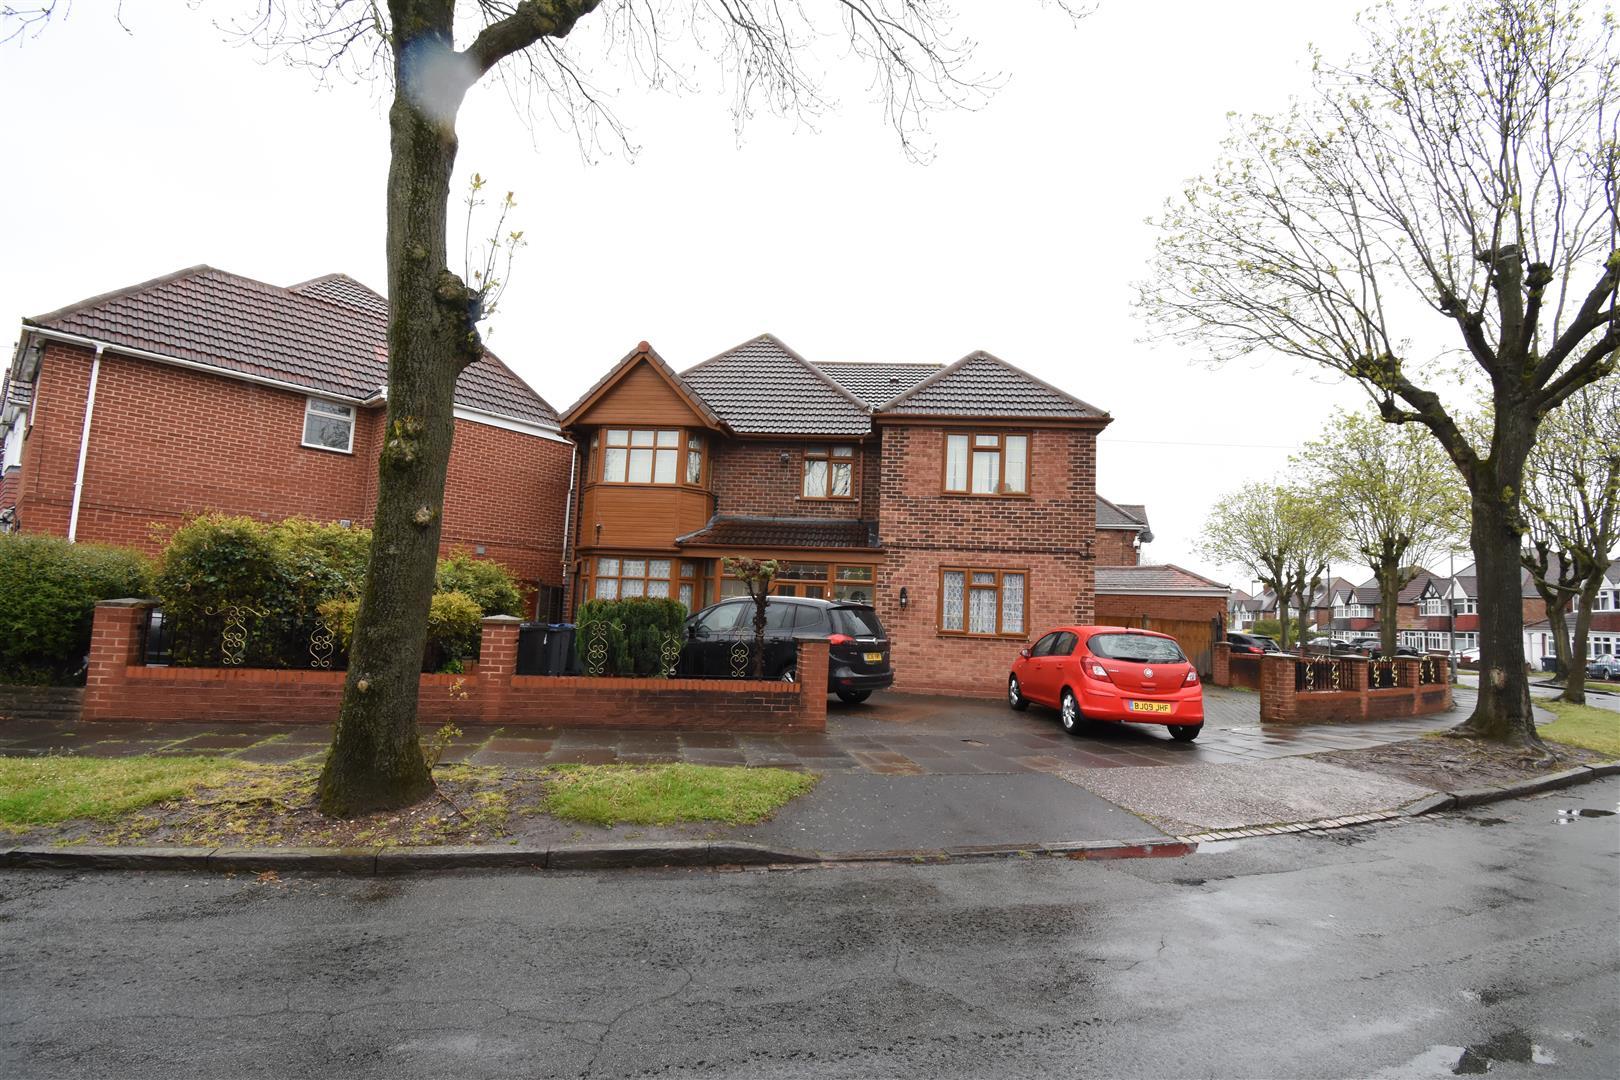 5 bed house for sale in Douglas Avenue, Hodge Hill, Birmingham, B36